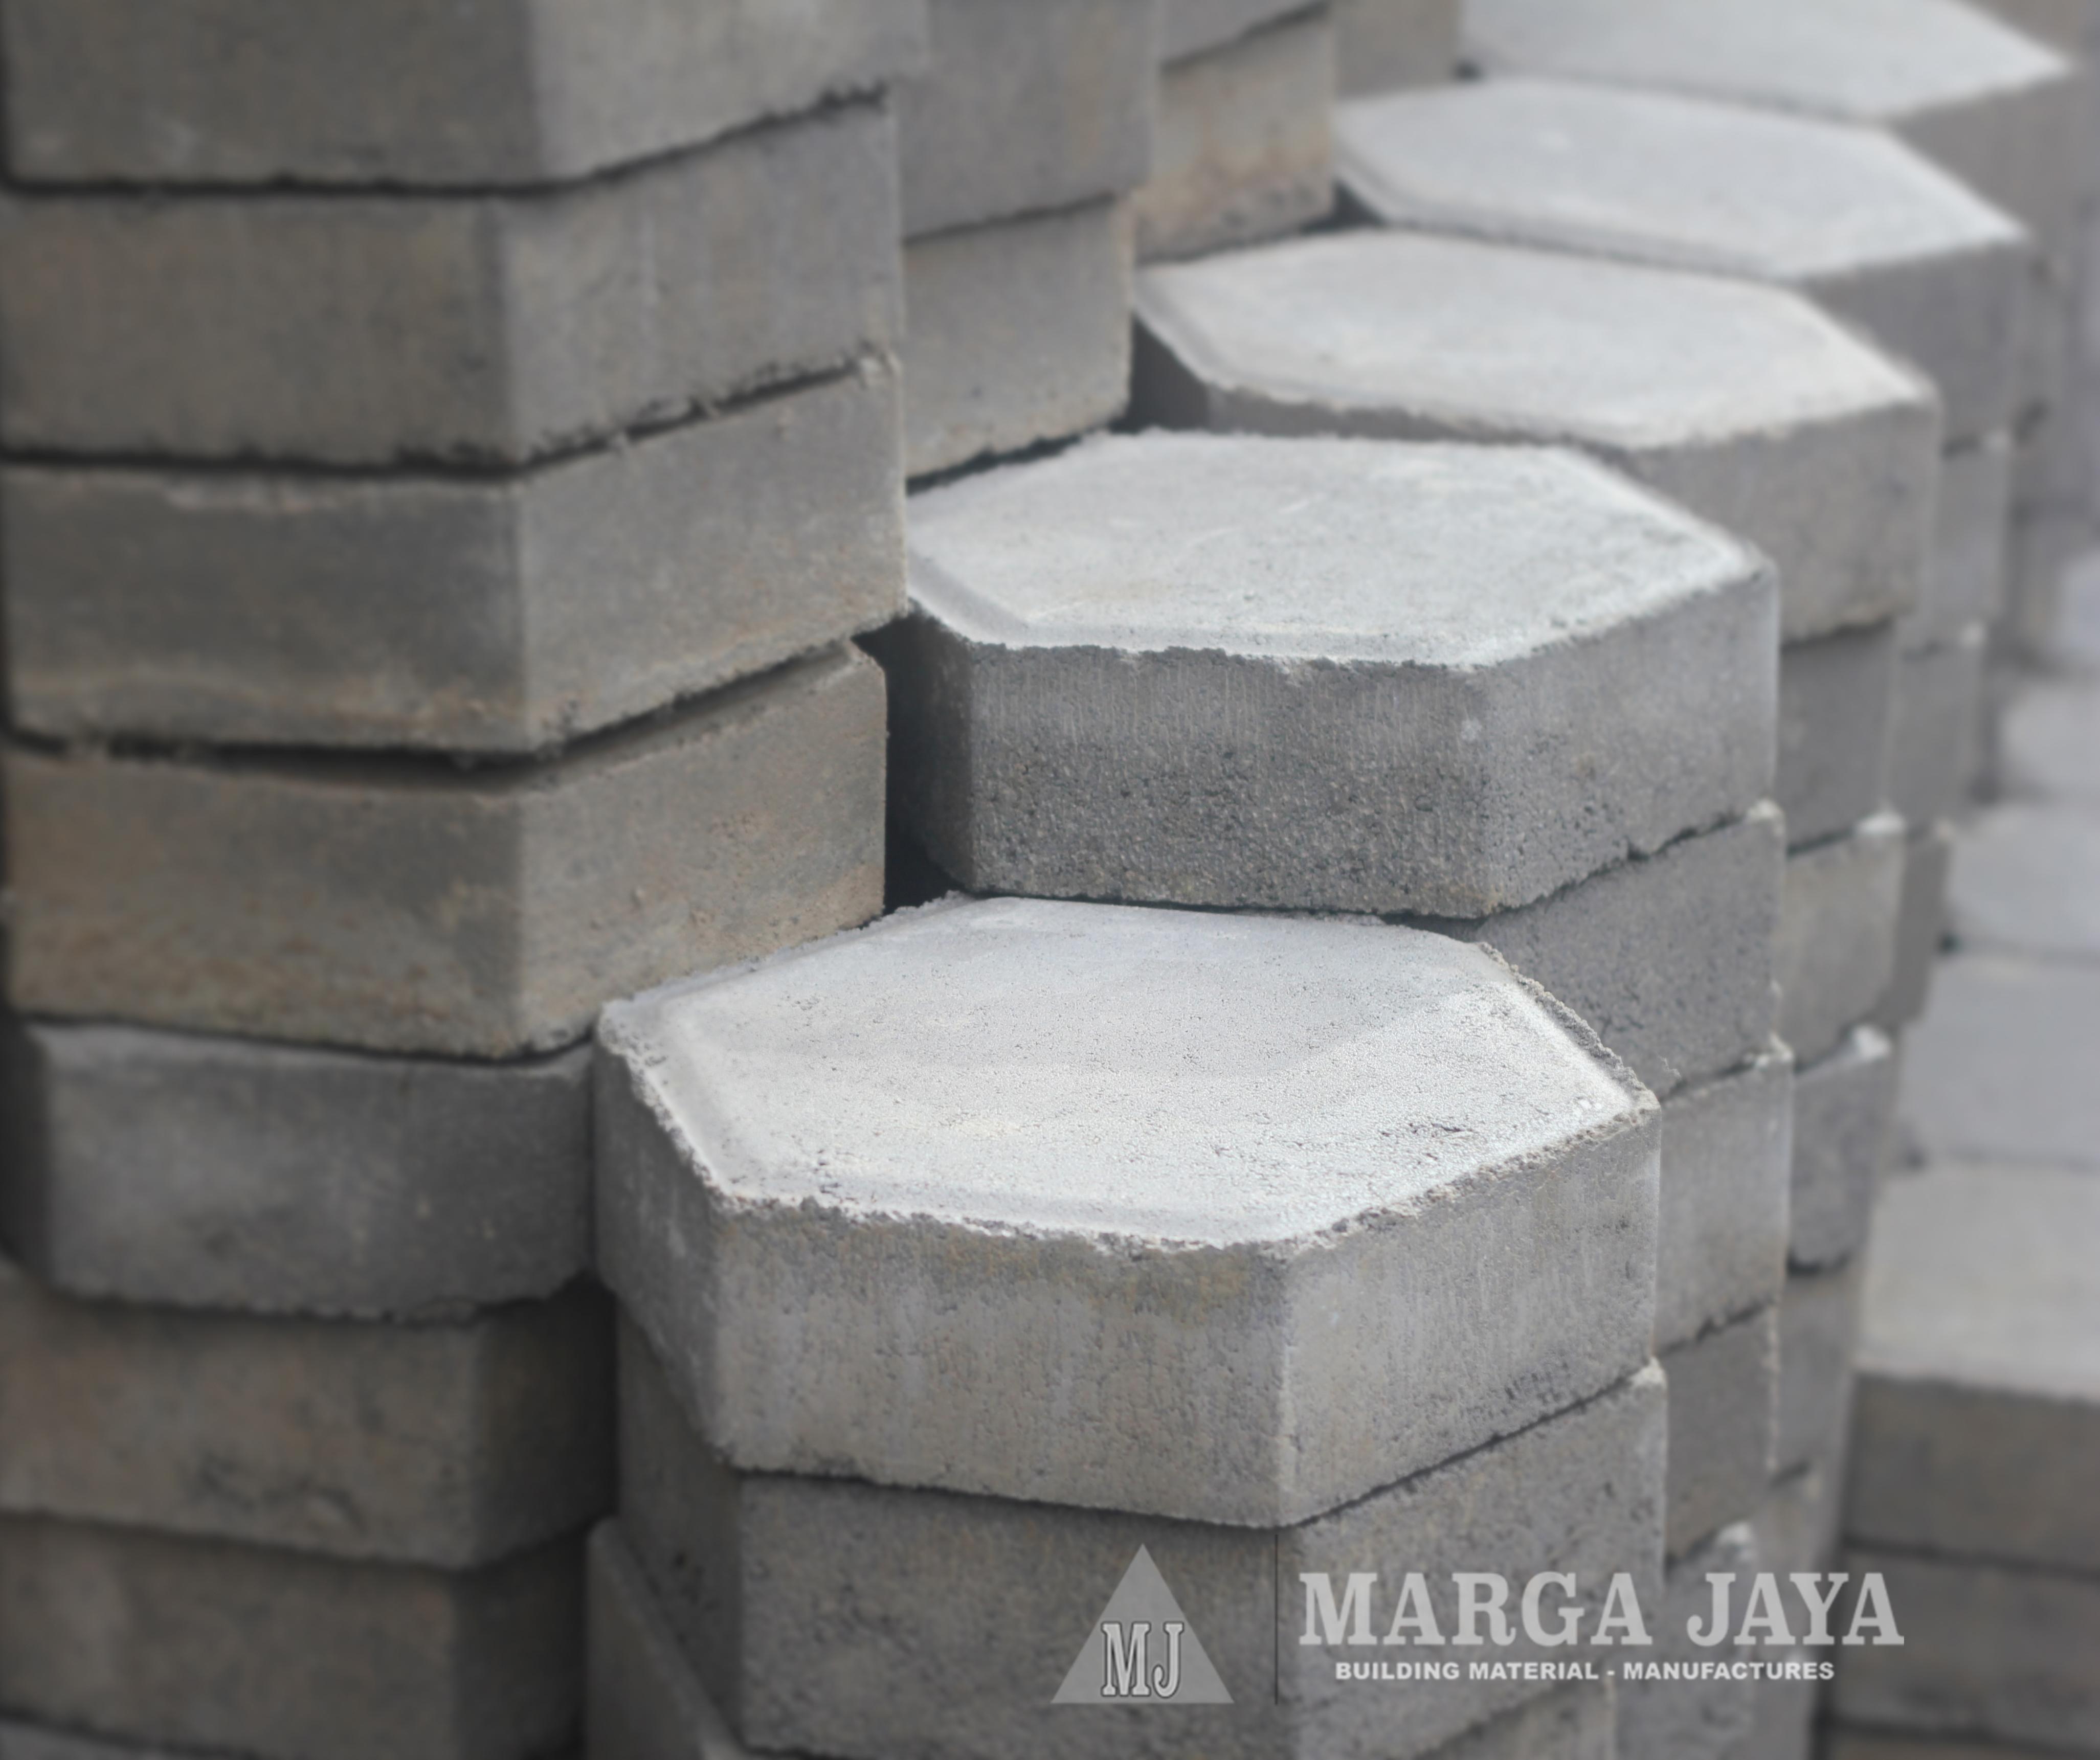 Paving Block \/ Conblock Segi Enam Hexagon (Konblok) Marga Jaya - Building Material Manufactures